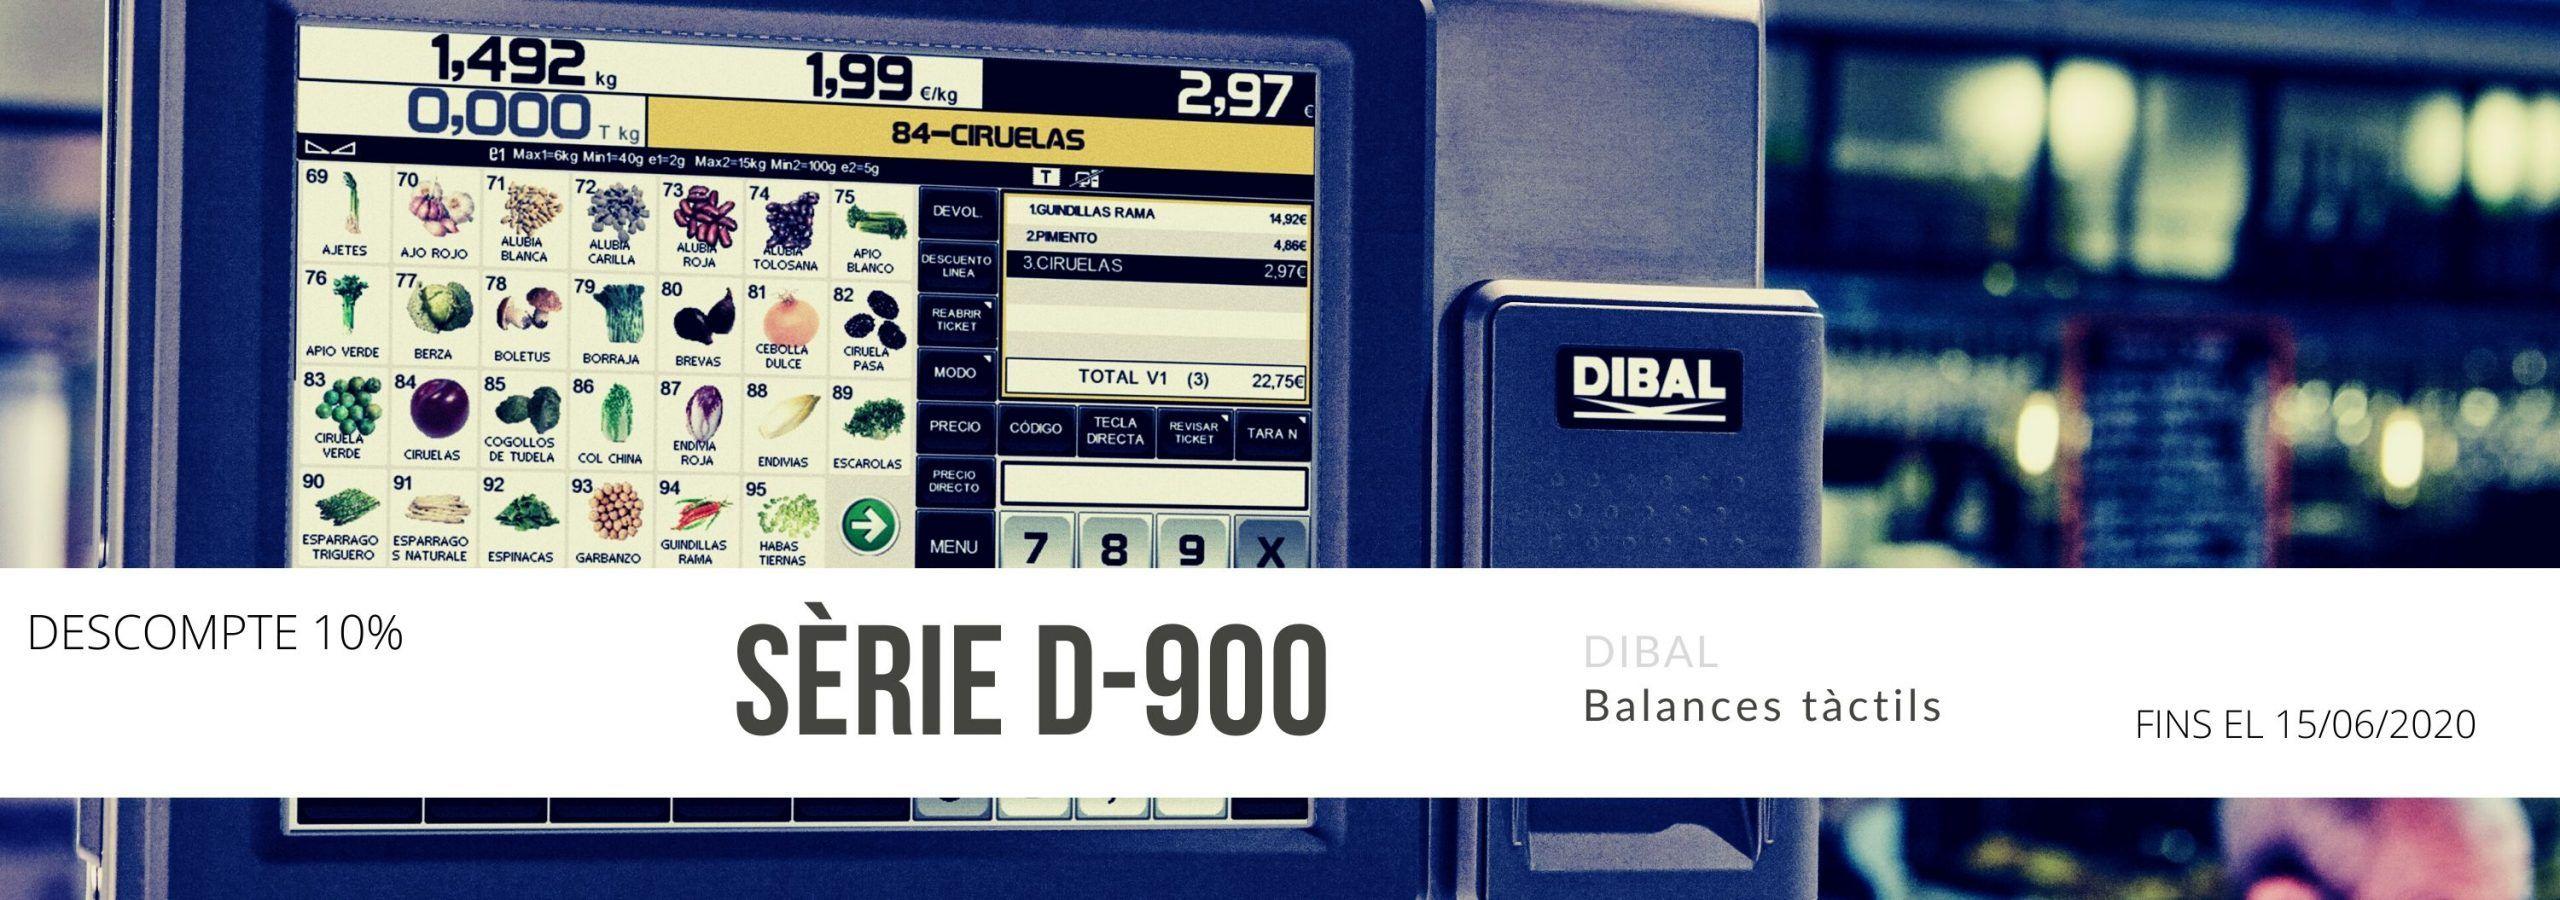 Ofertes en Balances Dibal D-900